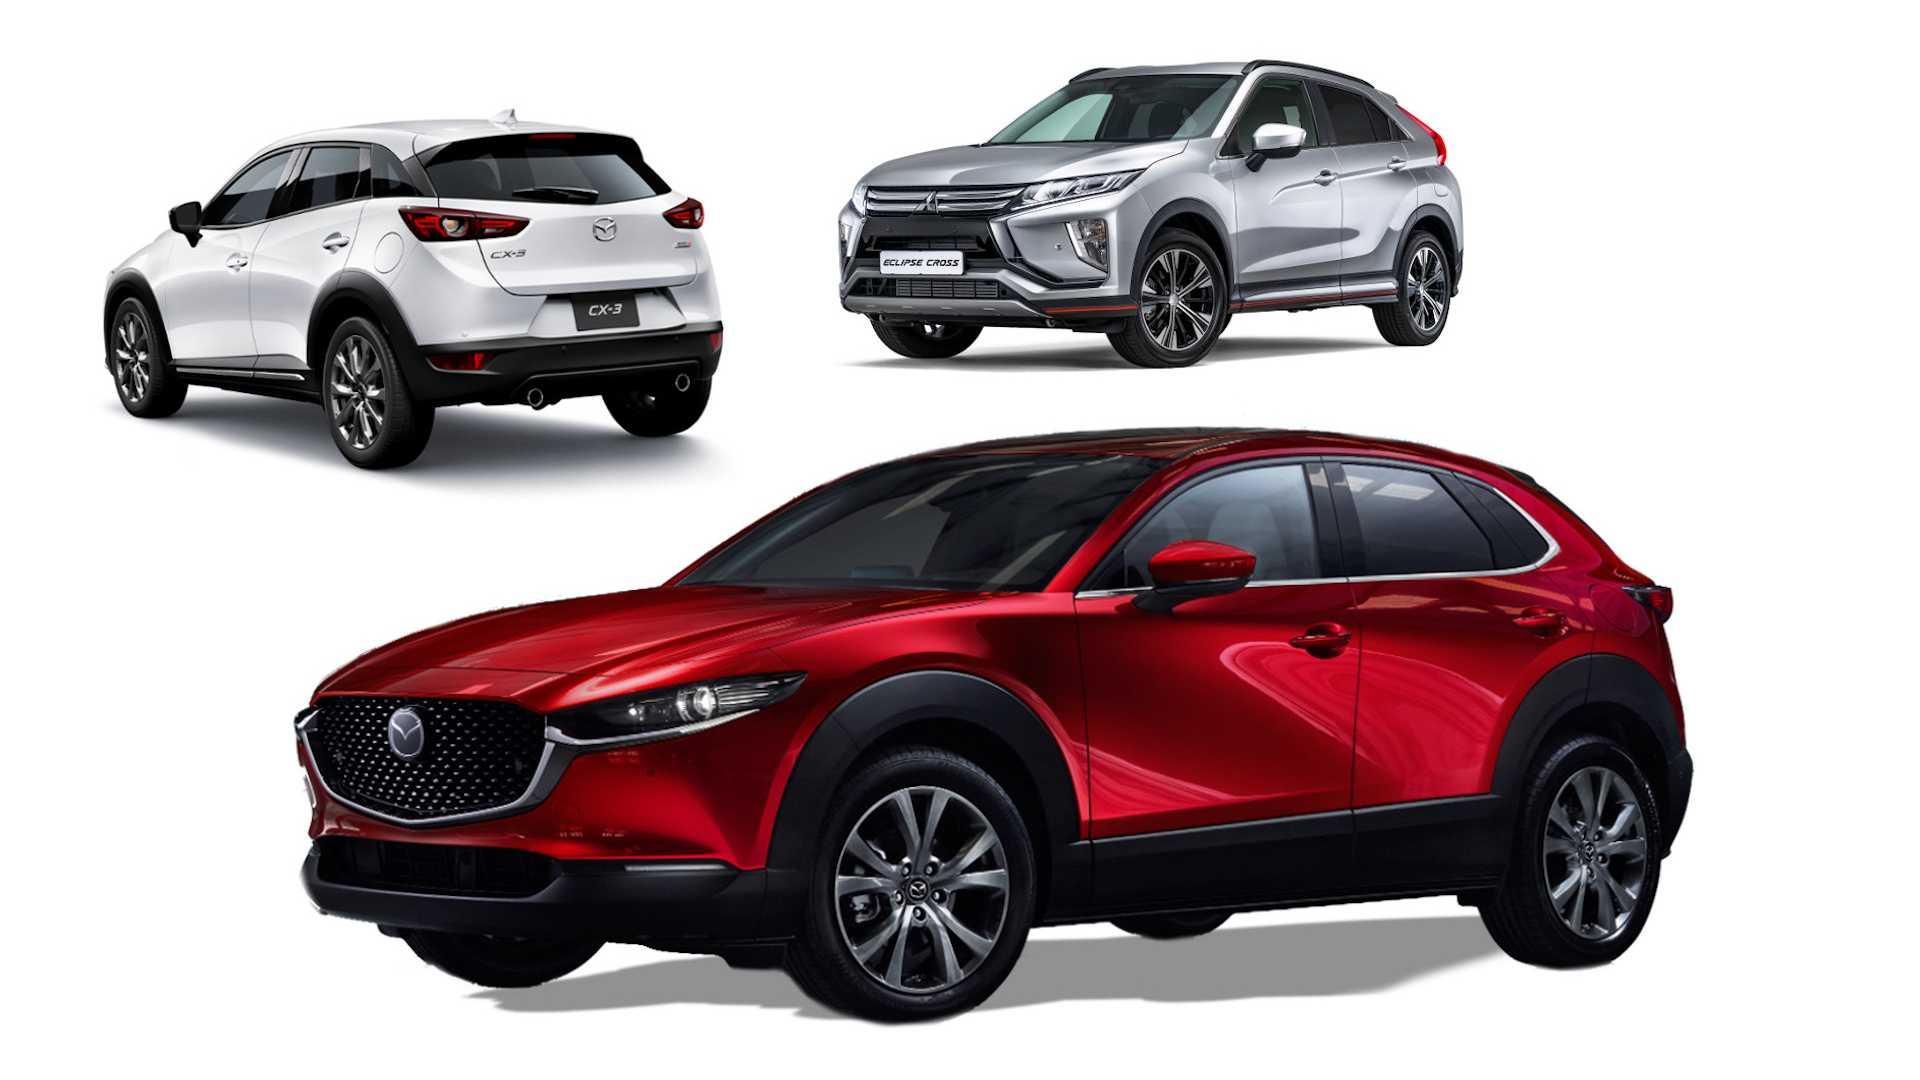 49 Great Mazda Cx 5 Hybrid 2020 Pictures by Mazda Cx 5 Hybrid 2020